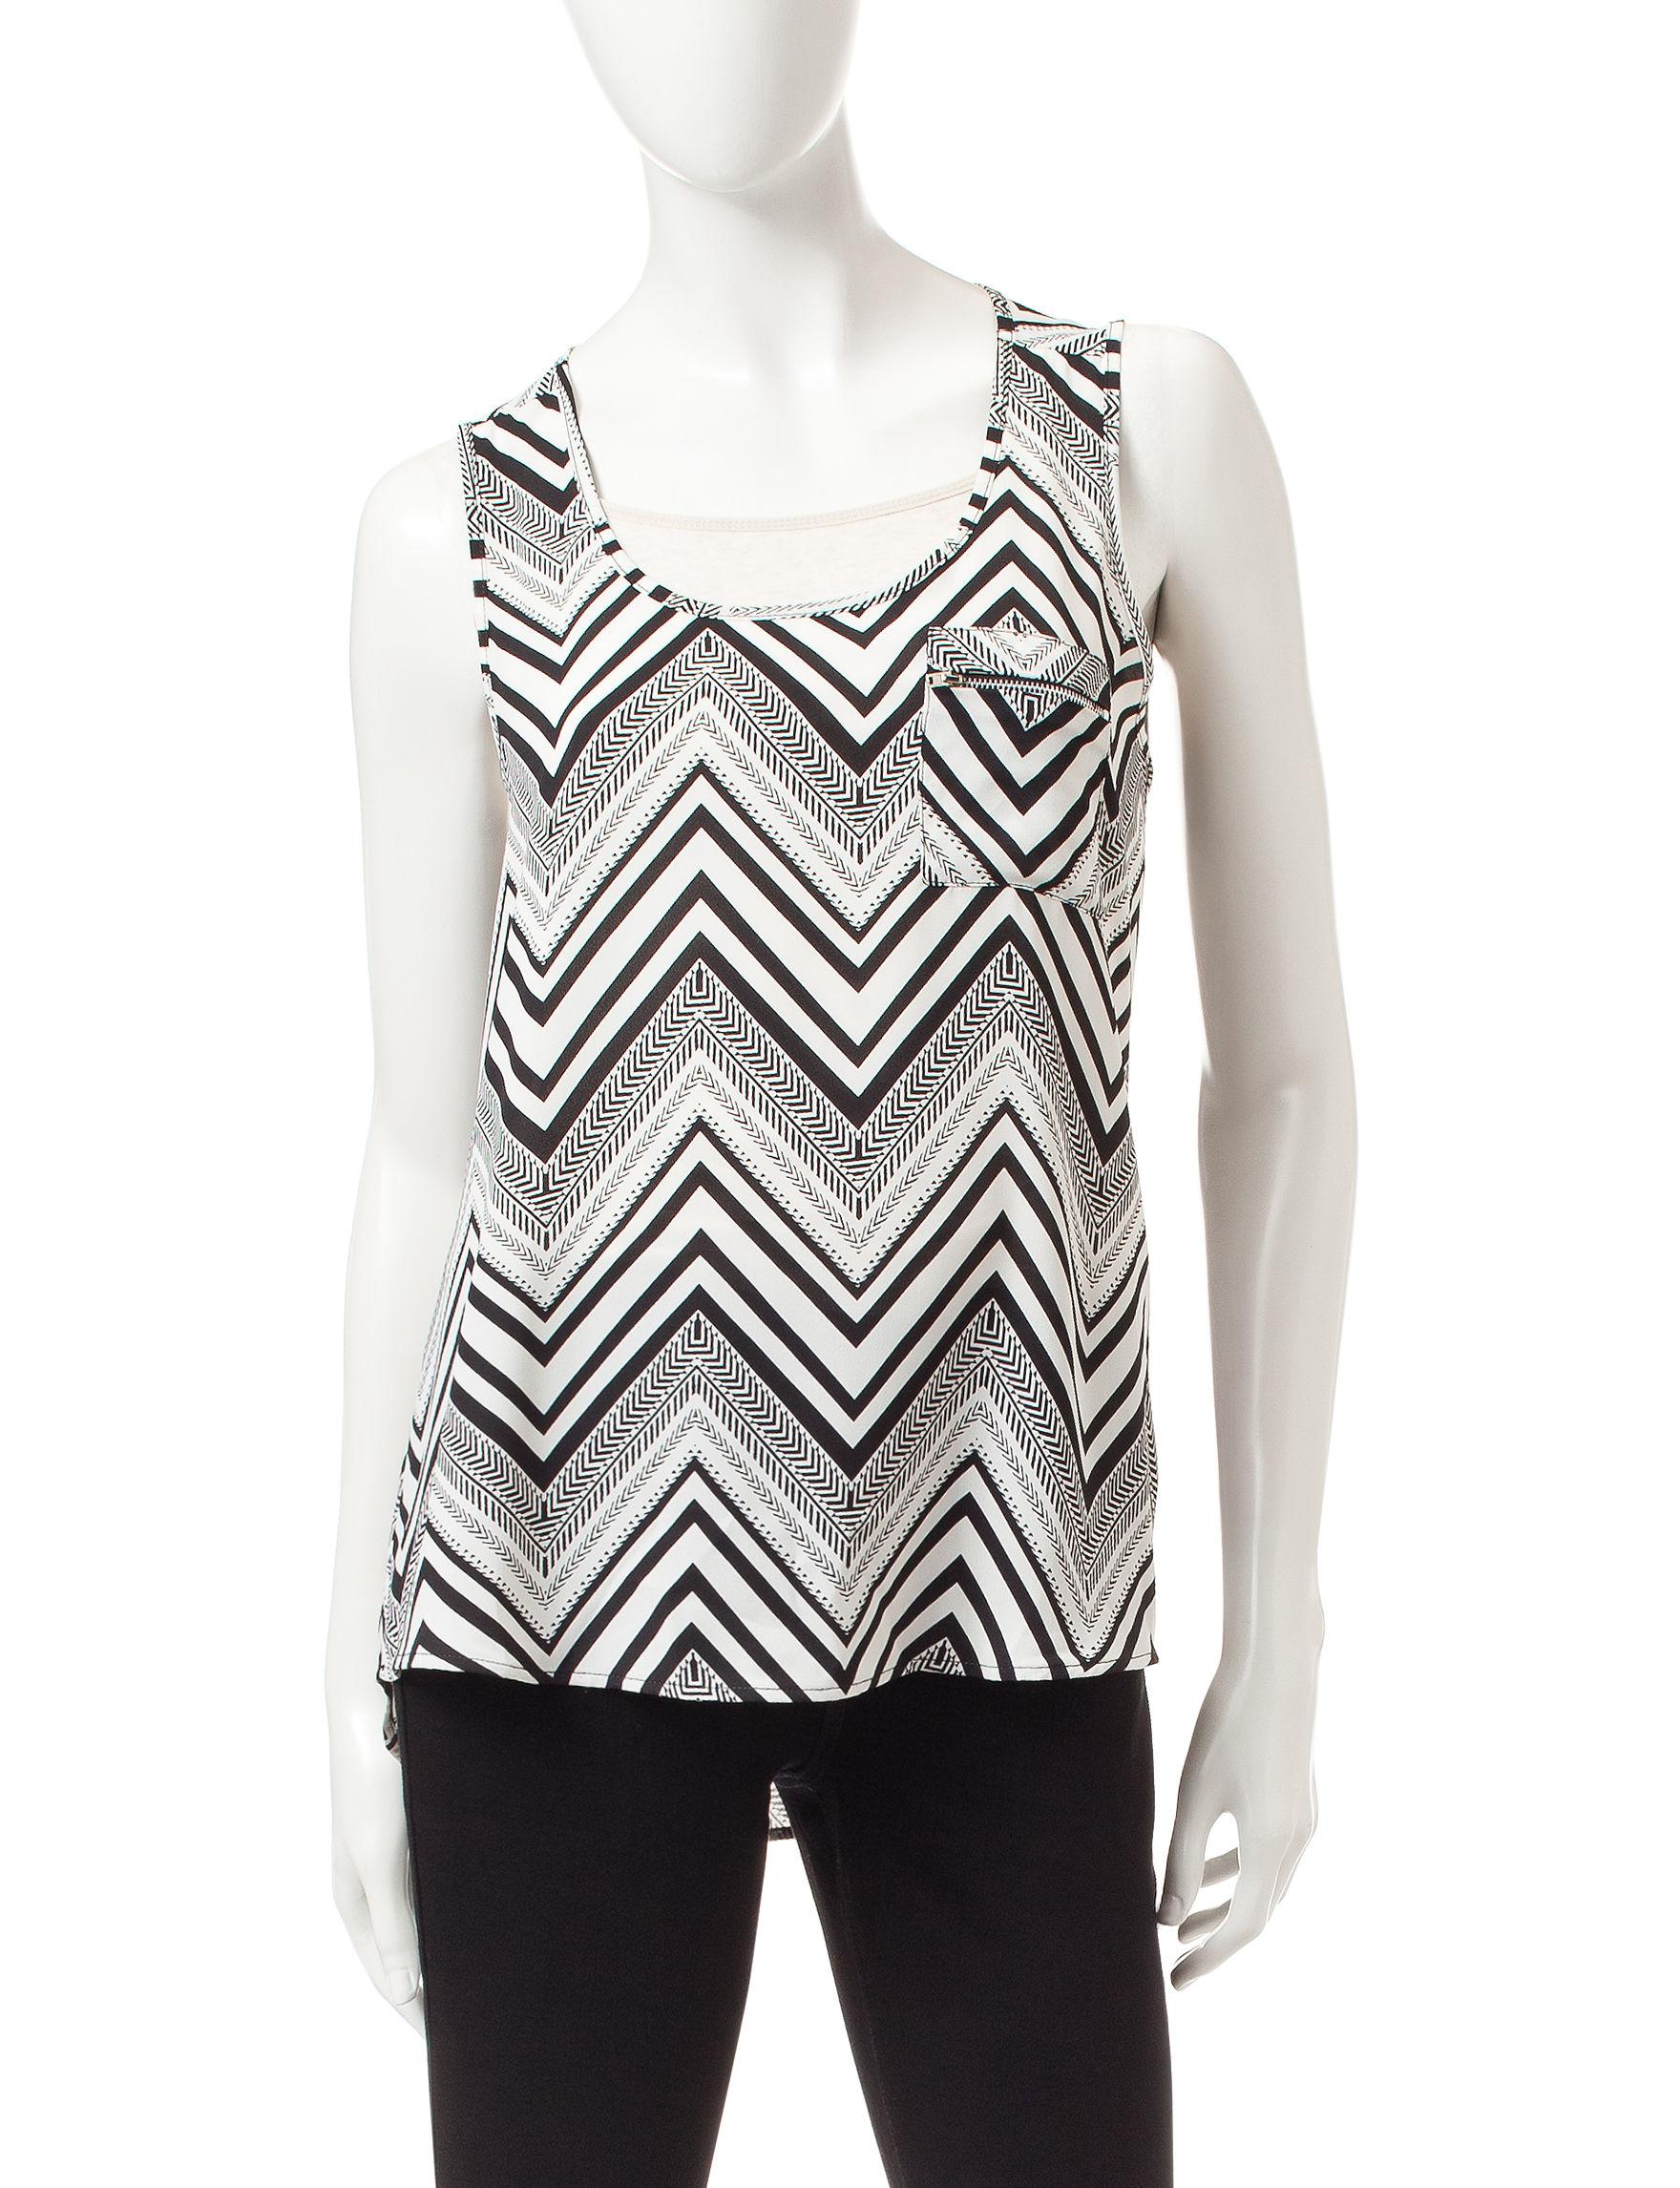 Signature Studio Black /  White Shirts & Blouses